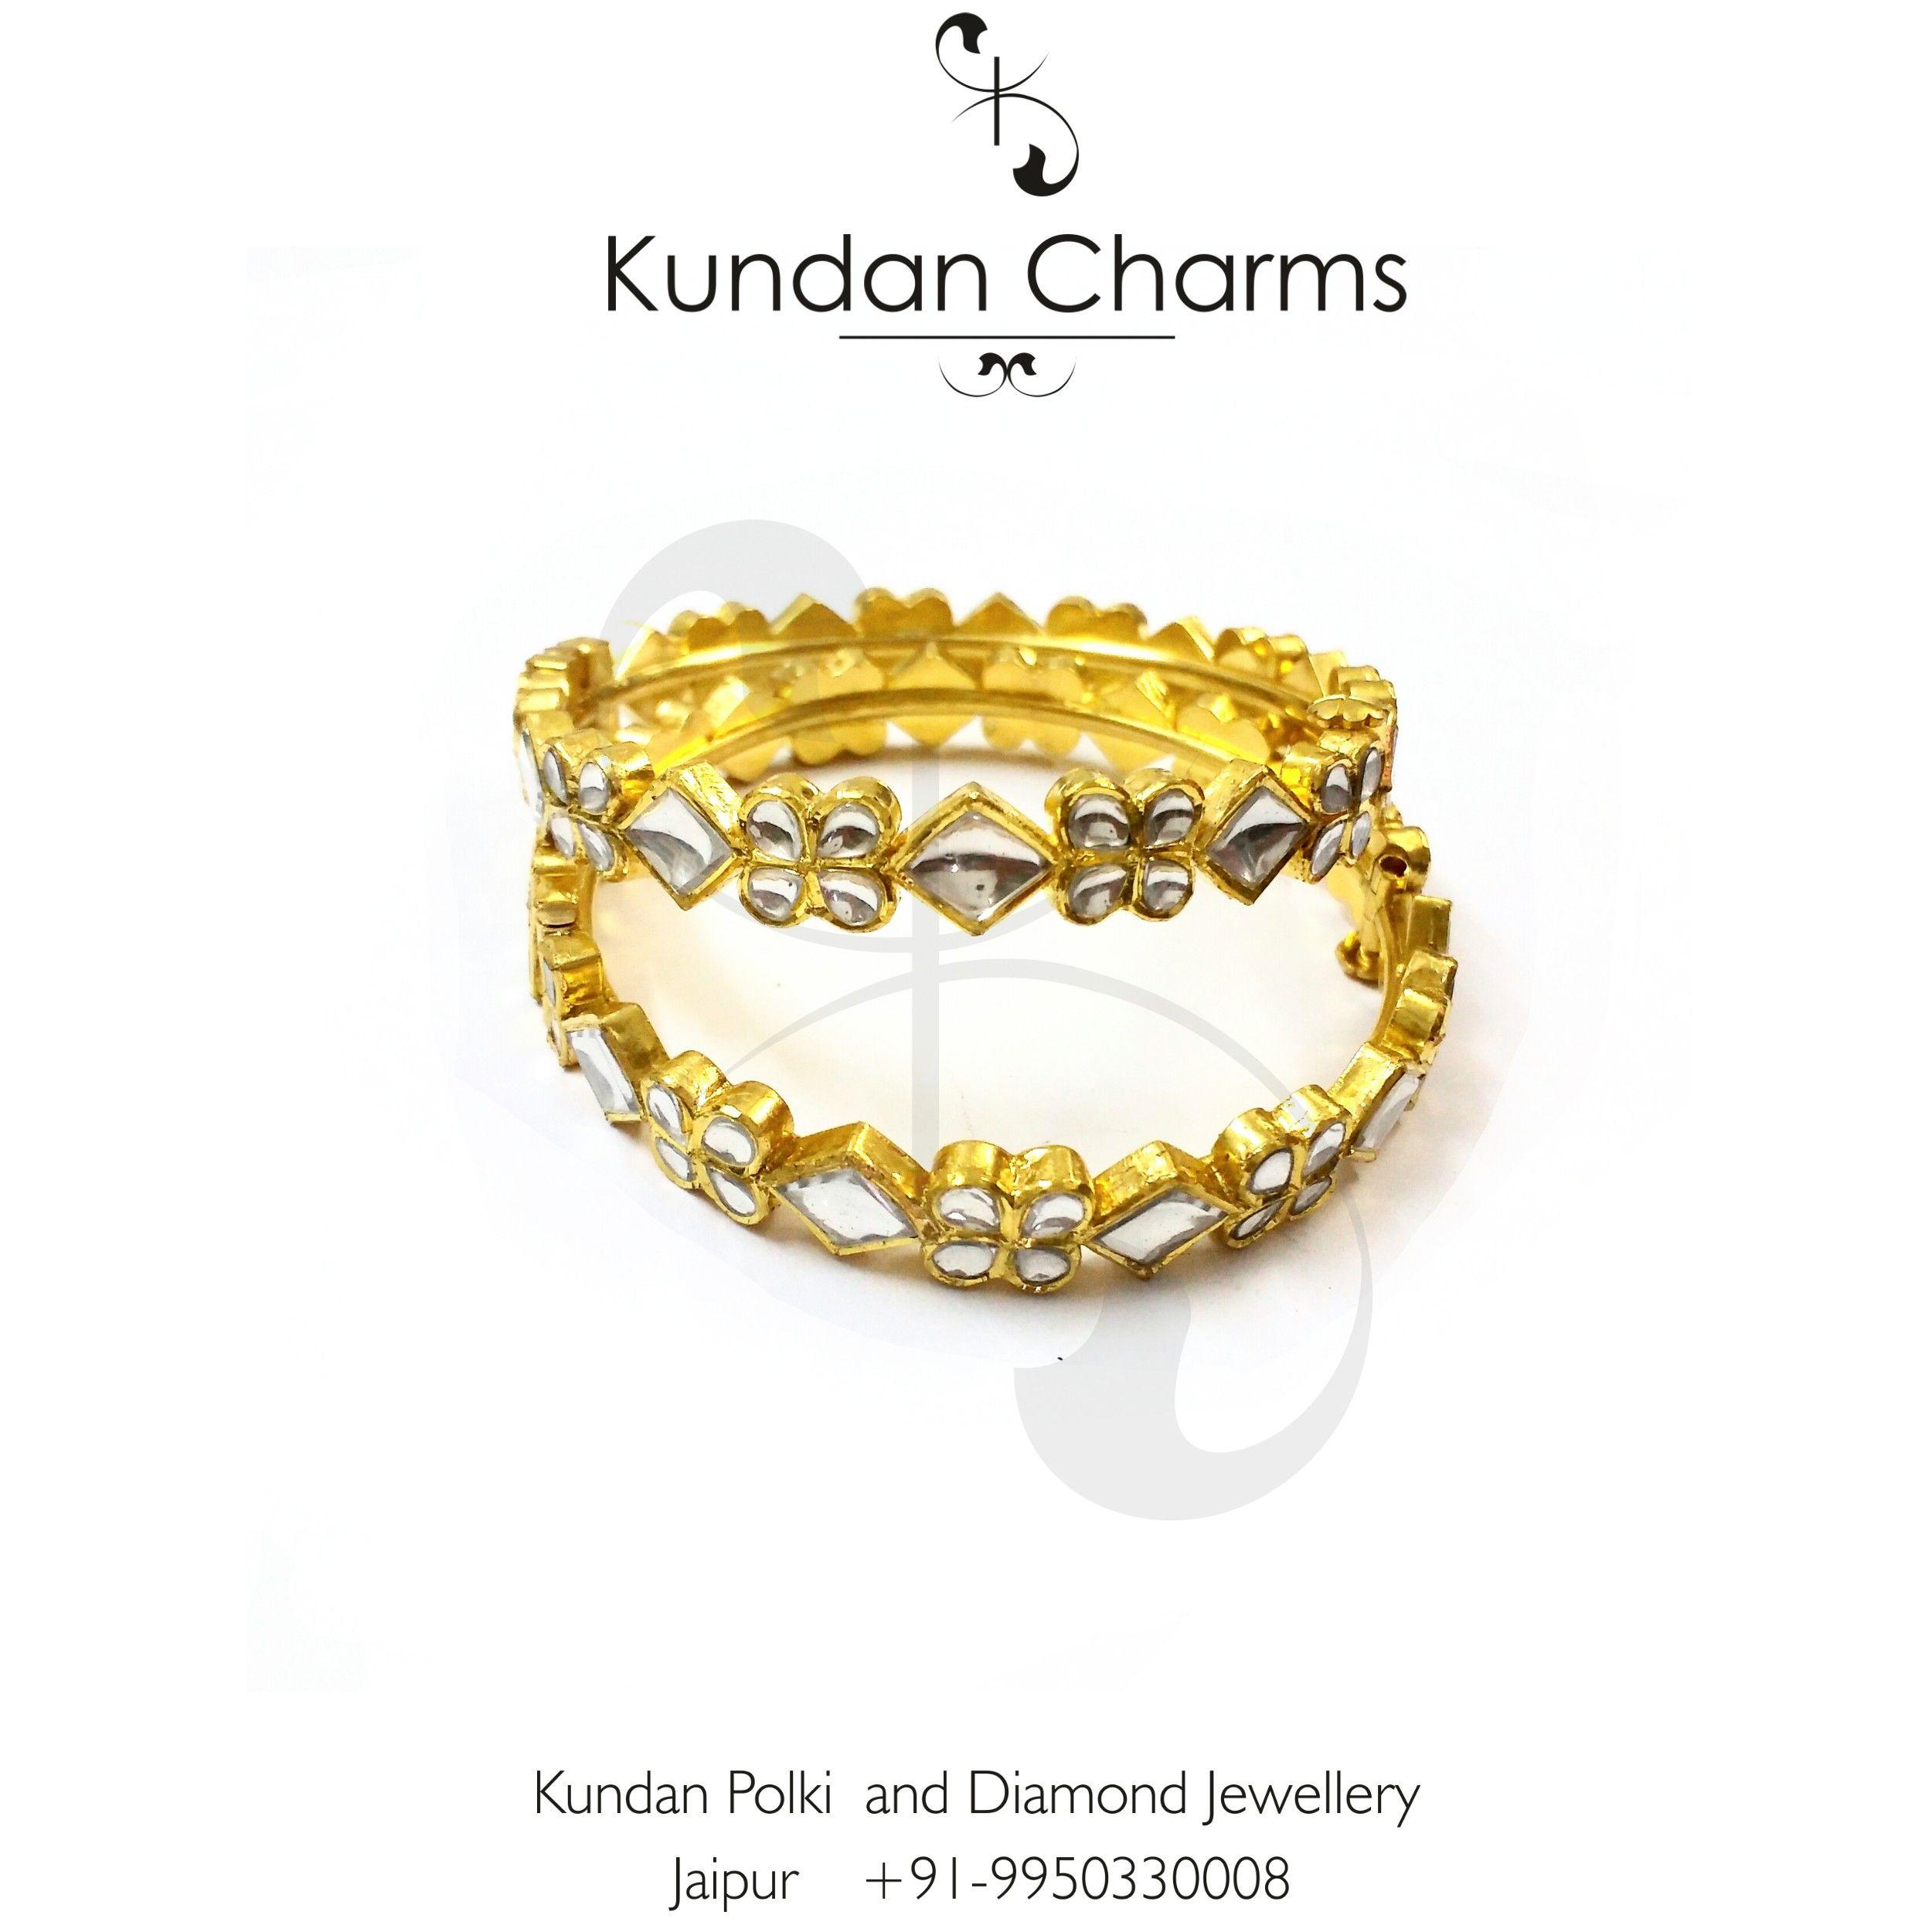 Kundan Polki Bangles, ready to wear.... #bangles #cuffs #bracelet #bracelets #kundancharms #instagram #jewelry #jewels #fashion #bling #trendy #accessories #love #beautiful #style #instagood #accessory #instajewelry #stylish #cute #jewelrygram #fashionjewelry #instapic #instadaily #instalike #igdaily #igersoftheday  #braceletstacks #trendy